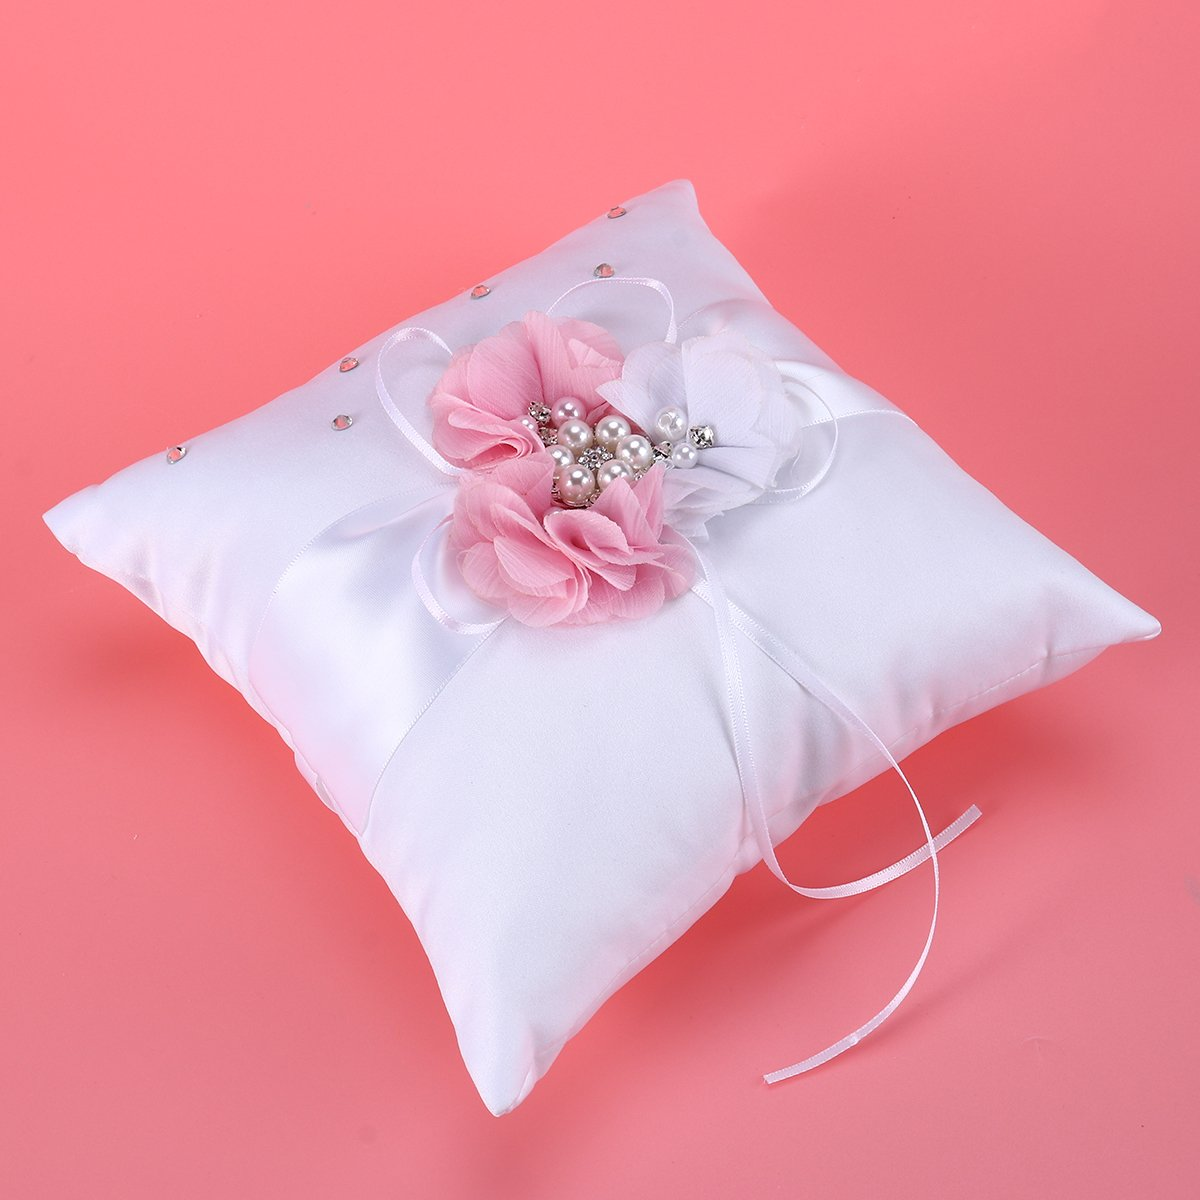 Amazon.com: NUOLUX Ring Bearer Pillow,2020cm Wedding Ring Pillow ...